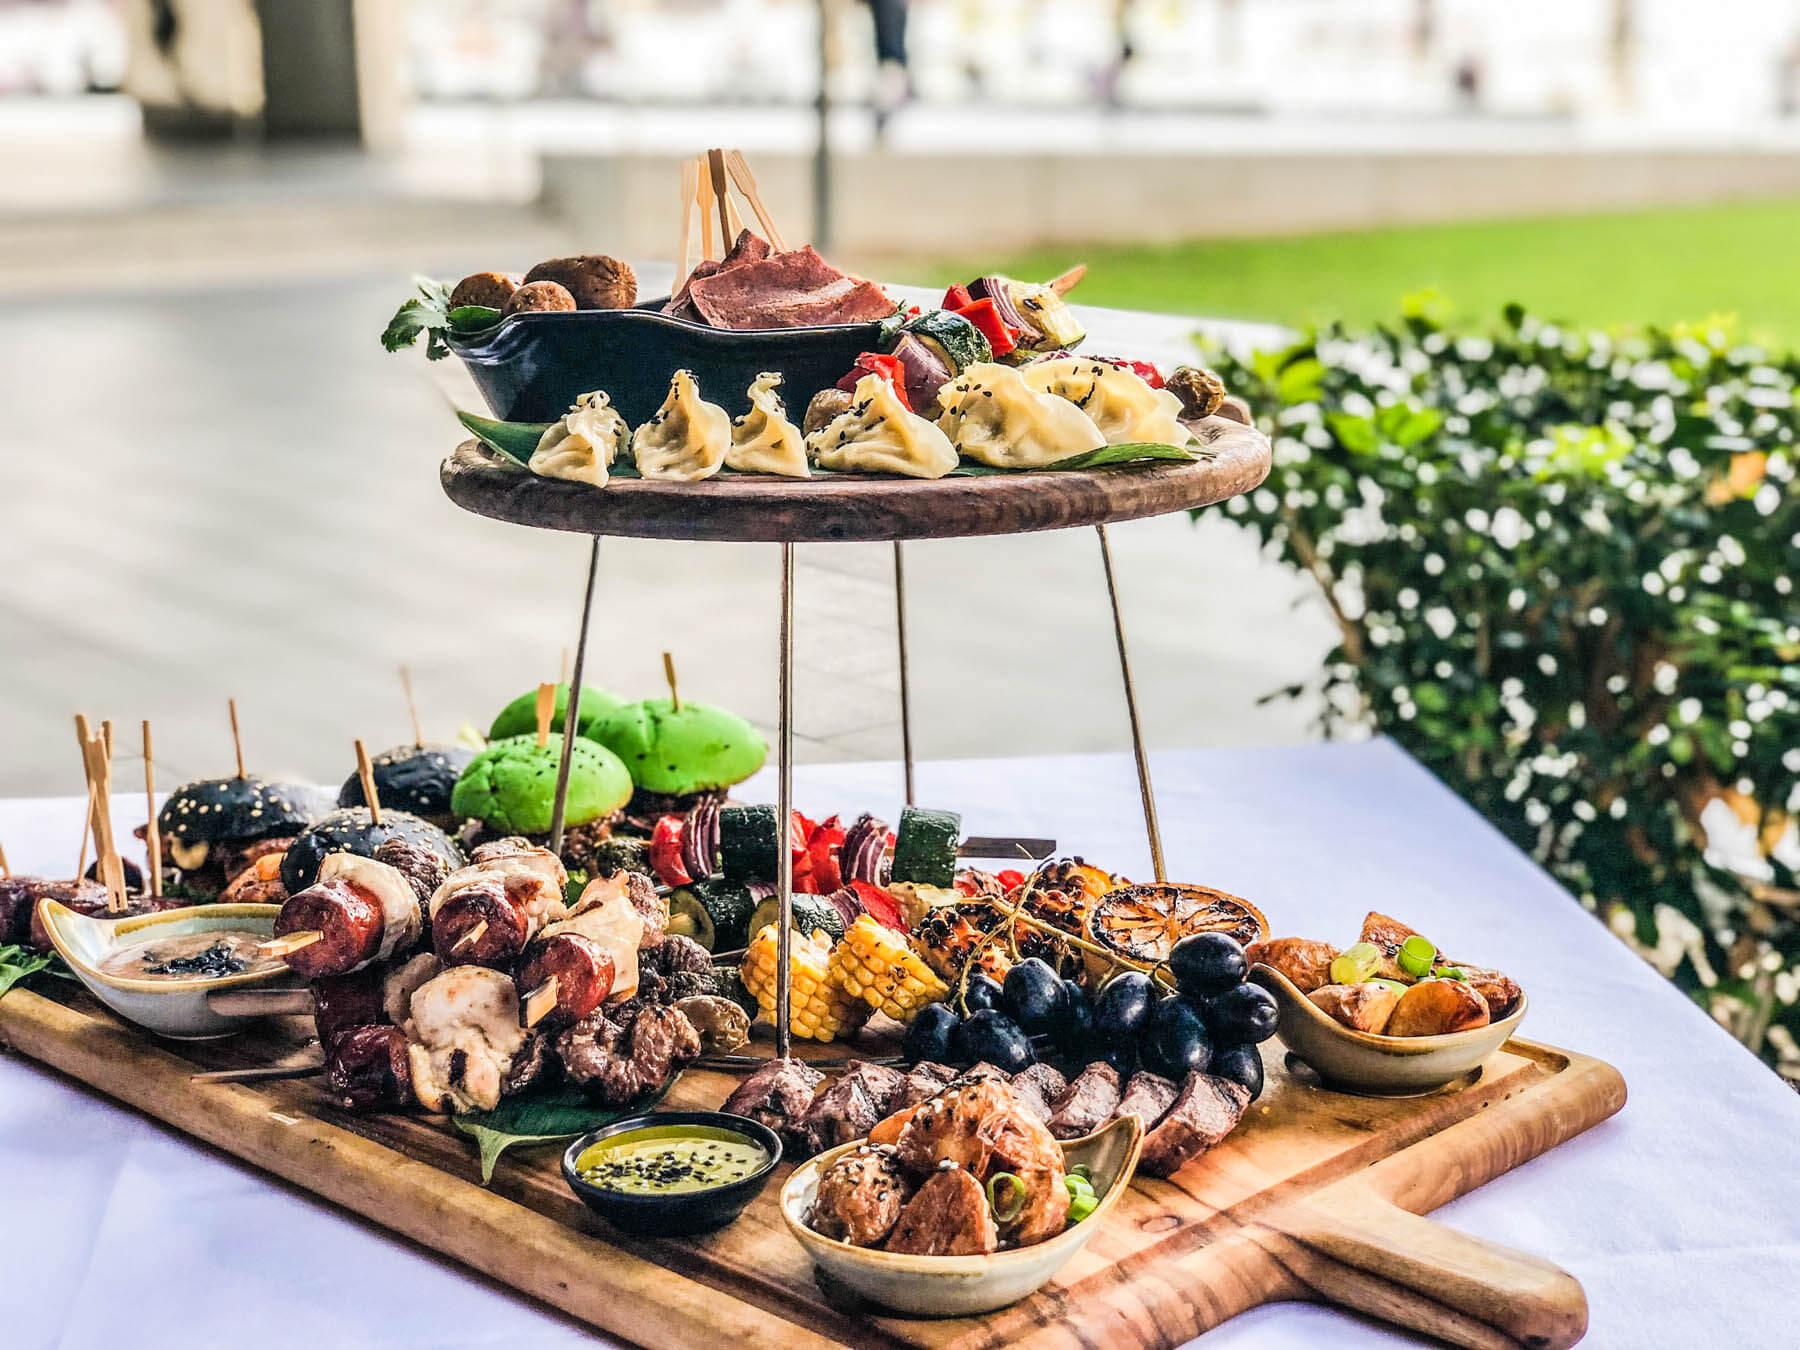 Hot food platter catering in Sydney